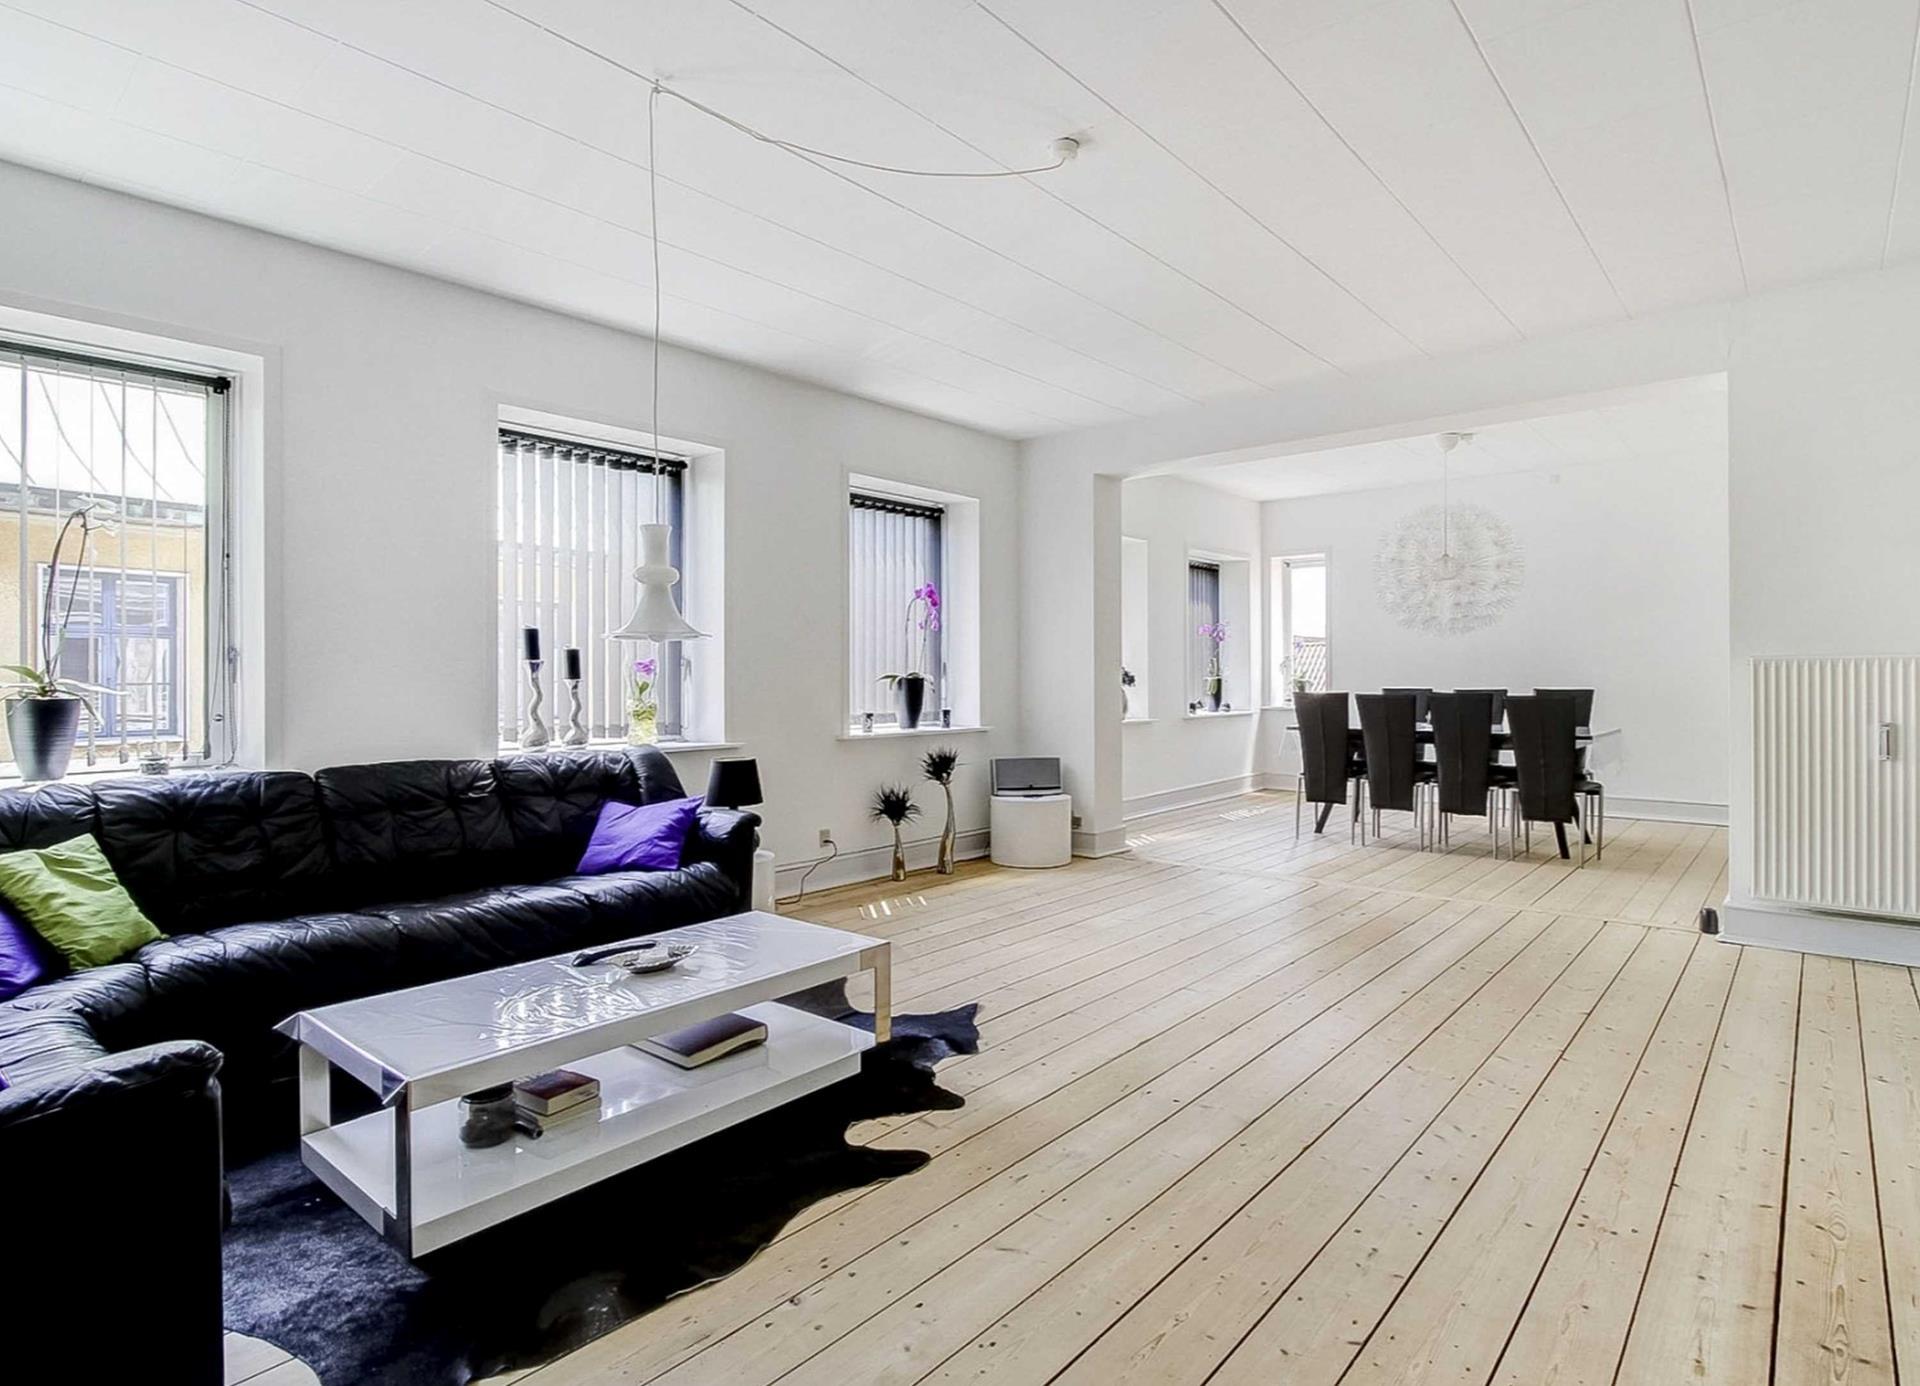 Bolig/erhverv på Store Rådhusgade i Sønderborg - Stue